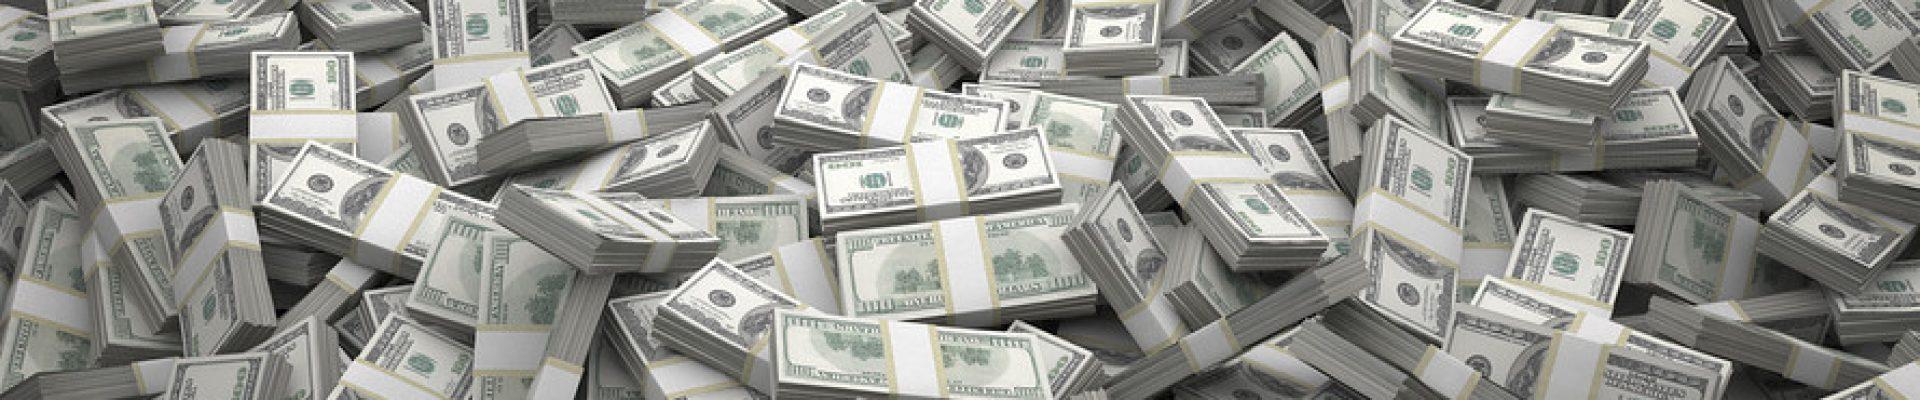 MW-ID331_cash_ZH_20200330110437.jpg